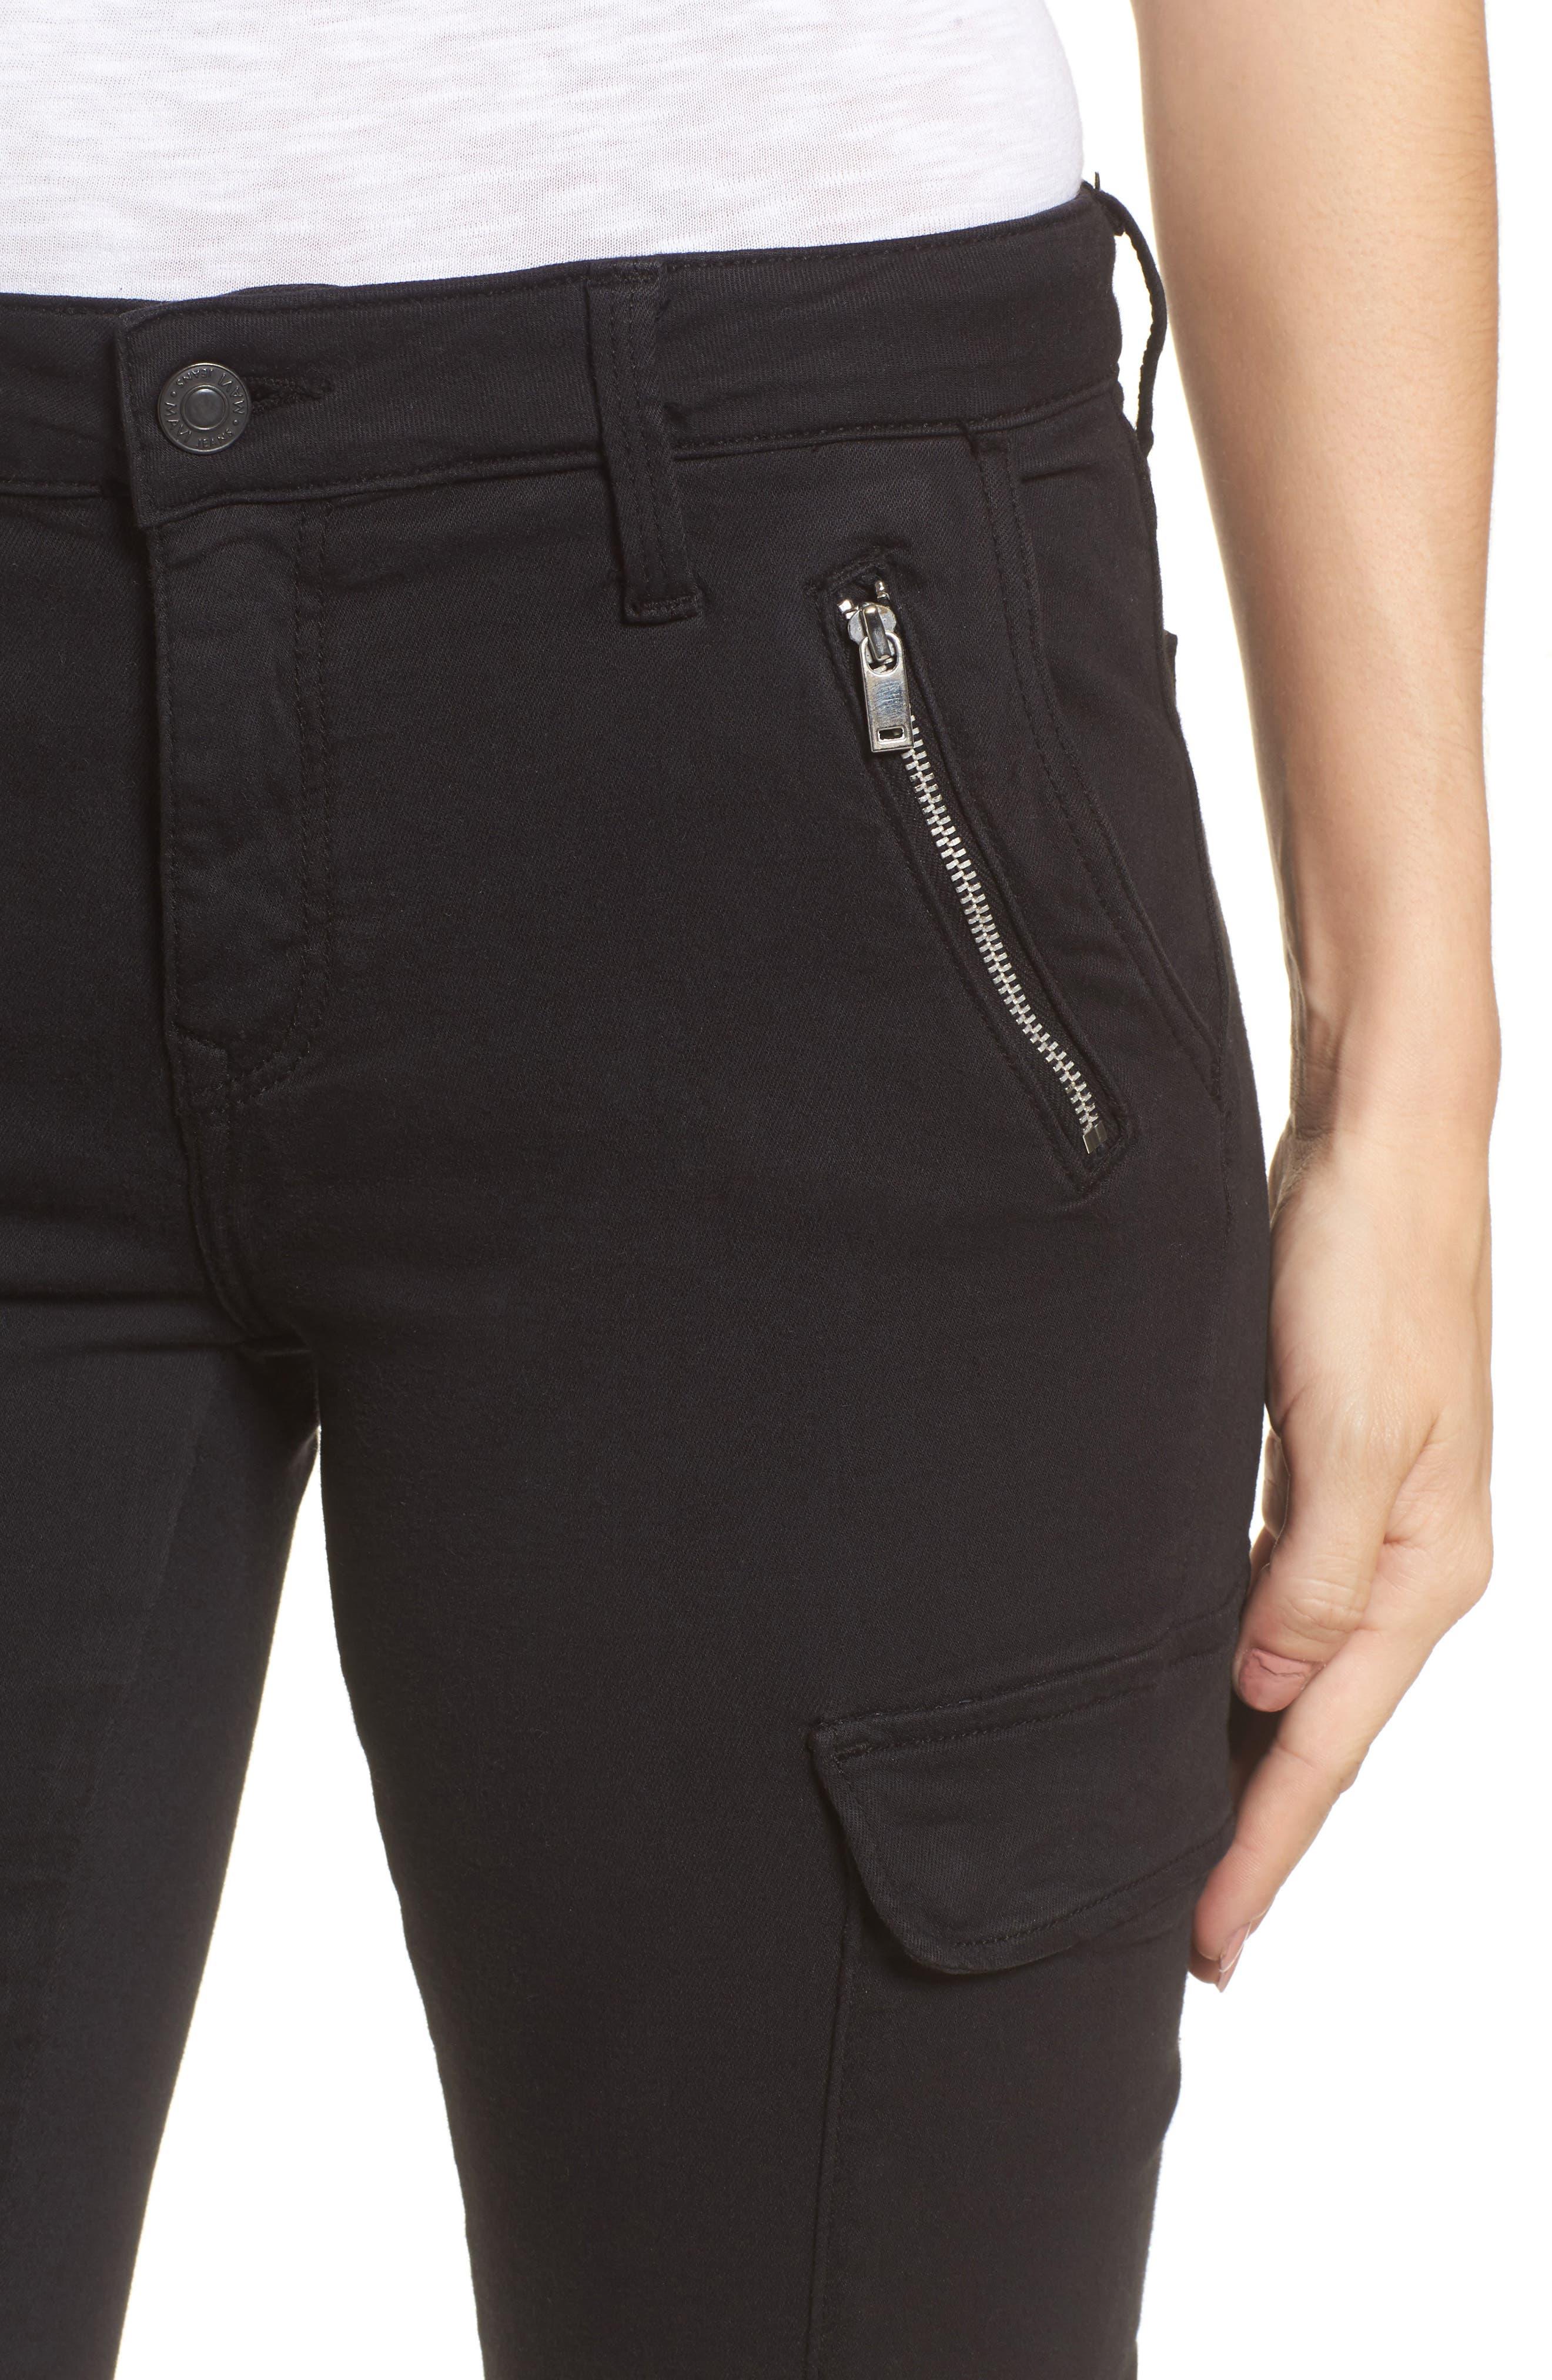 Juliette Skinny Cargo Pants,                             Alternate thumbnail 4, color,                             Black Twill